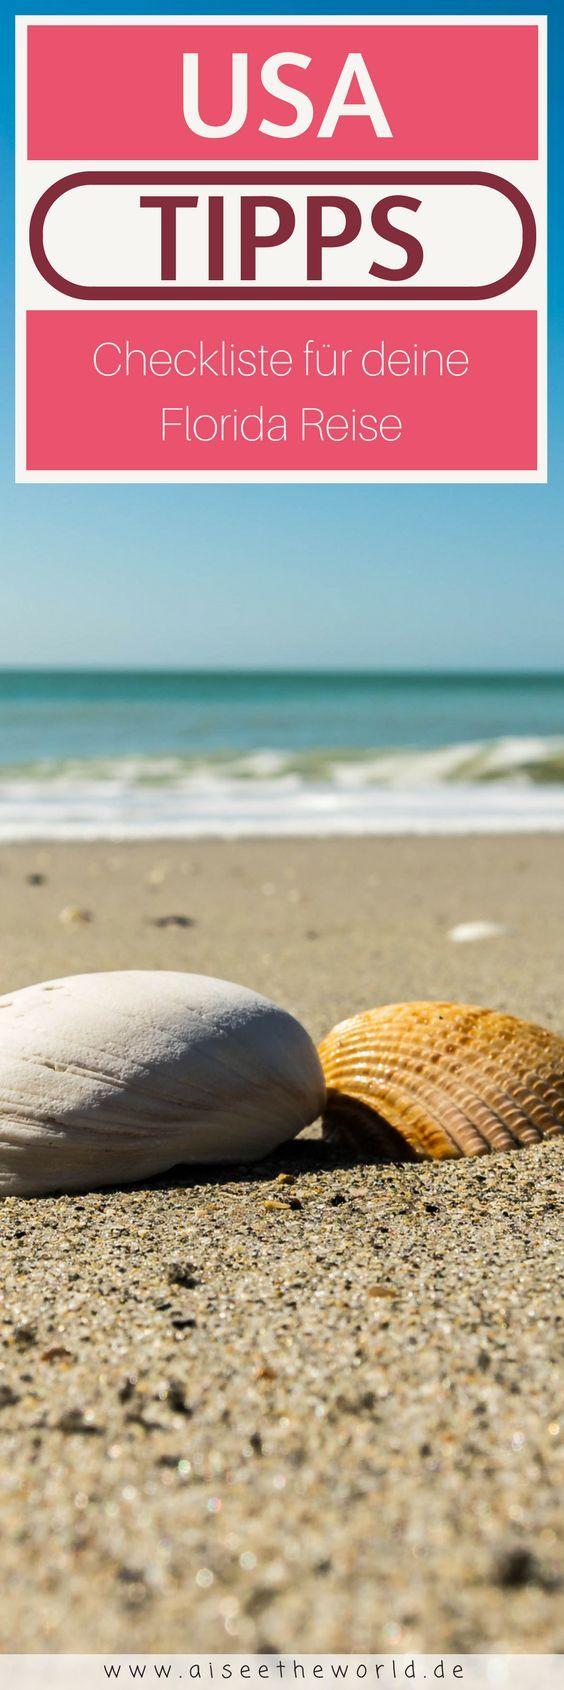 Checkliste Fur Deine Florida Reise Urlaub Florida Florida